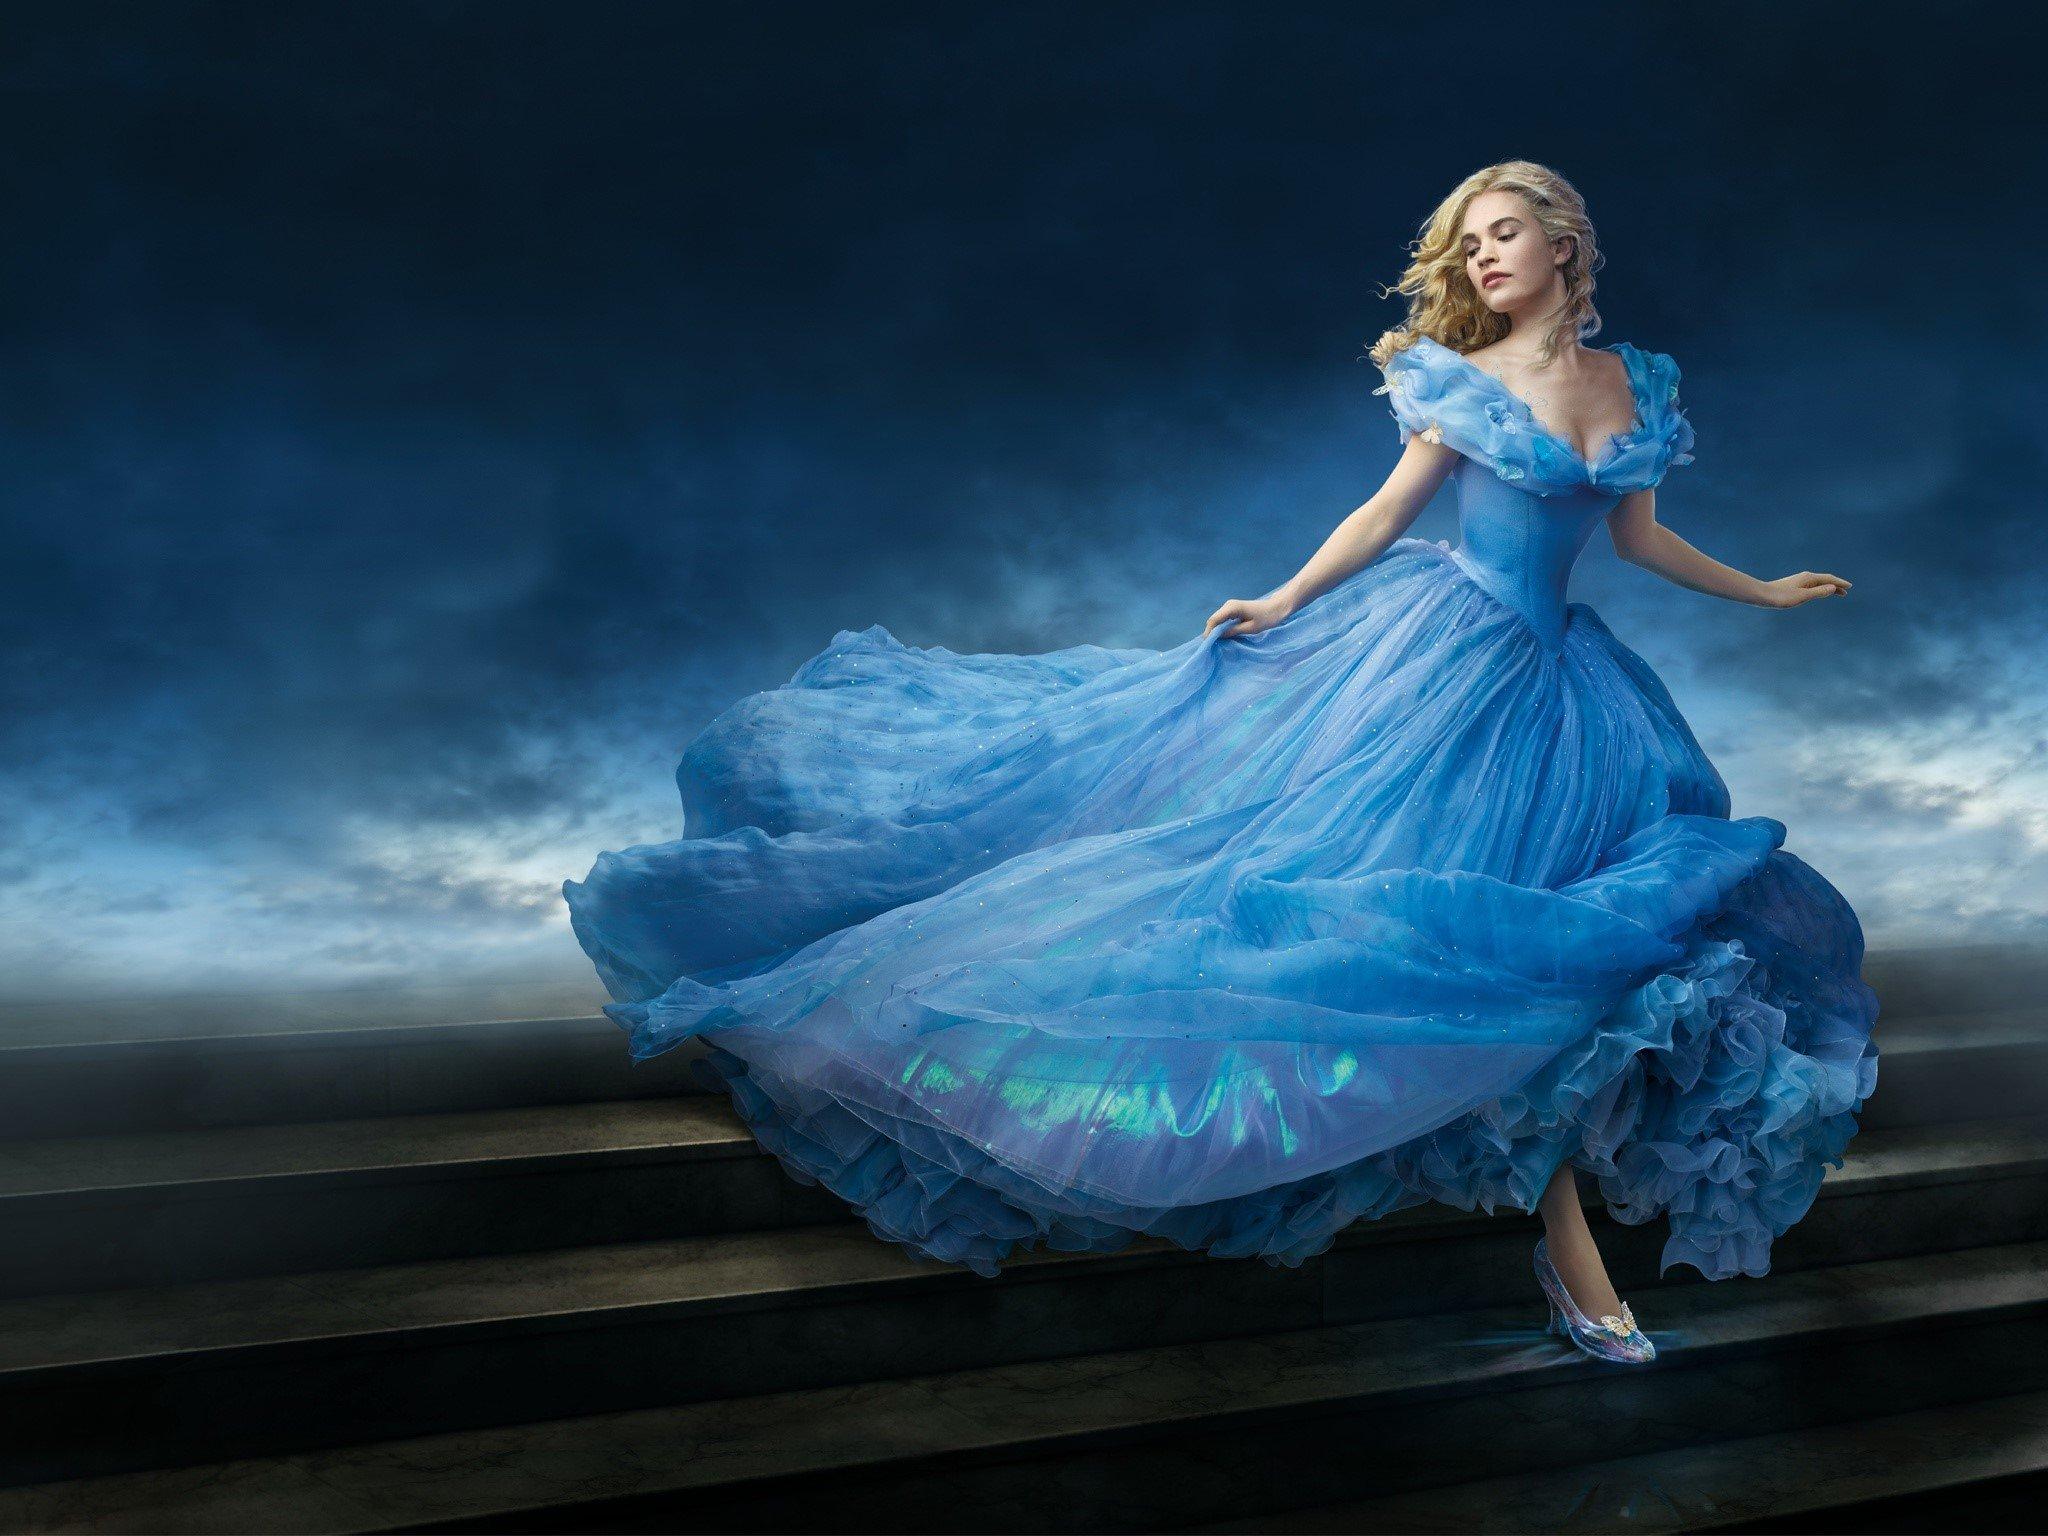 Fondos de pantalla Lily James como Cinderella